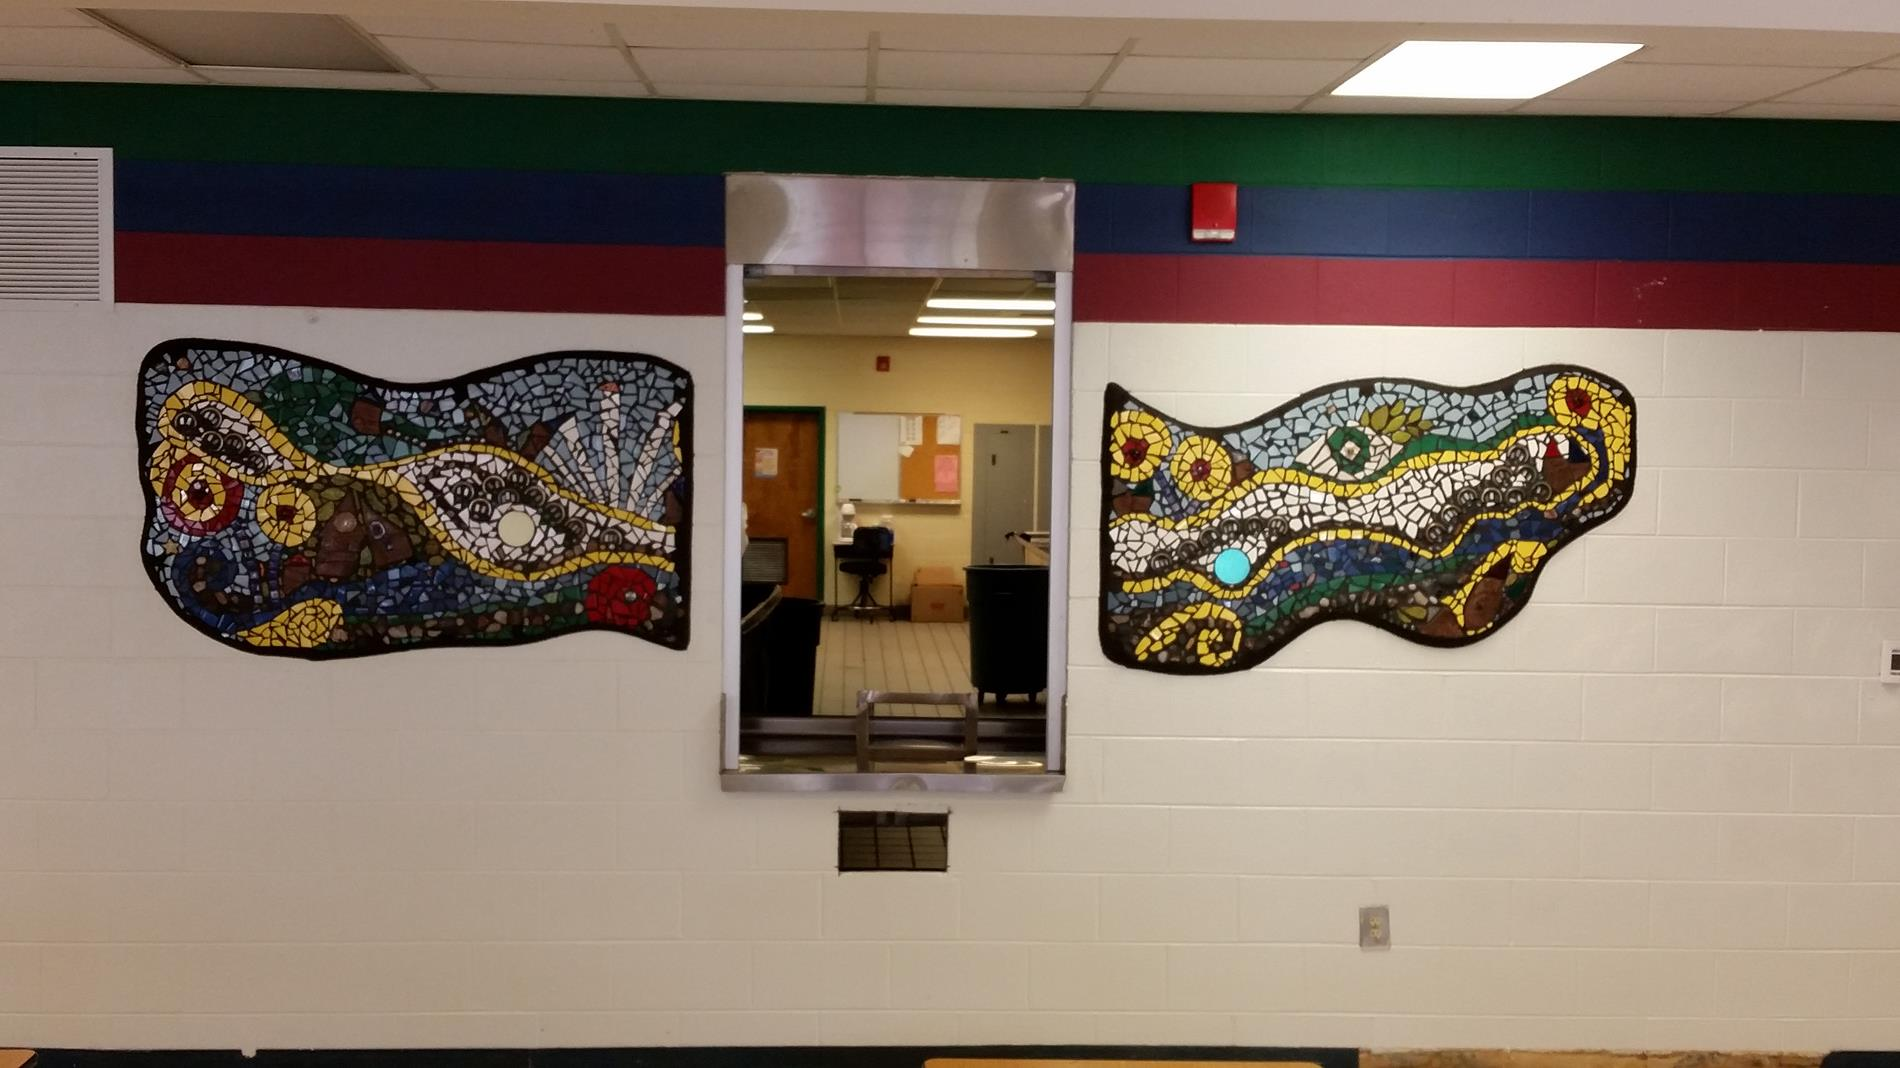 Cafeteria Mosaic